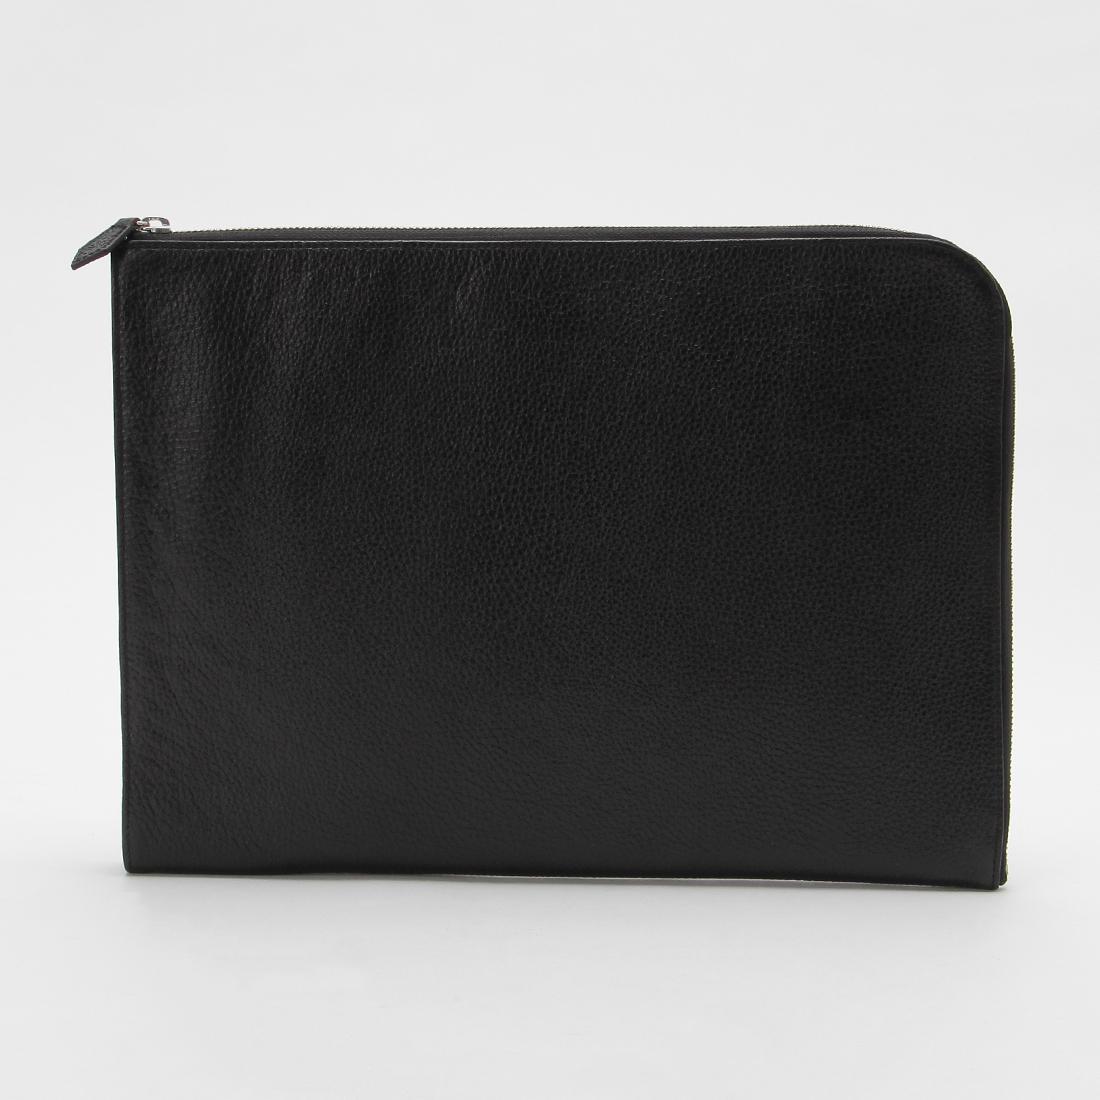 Clutch Bag 2012682: Black